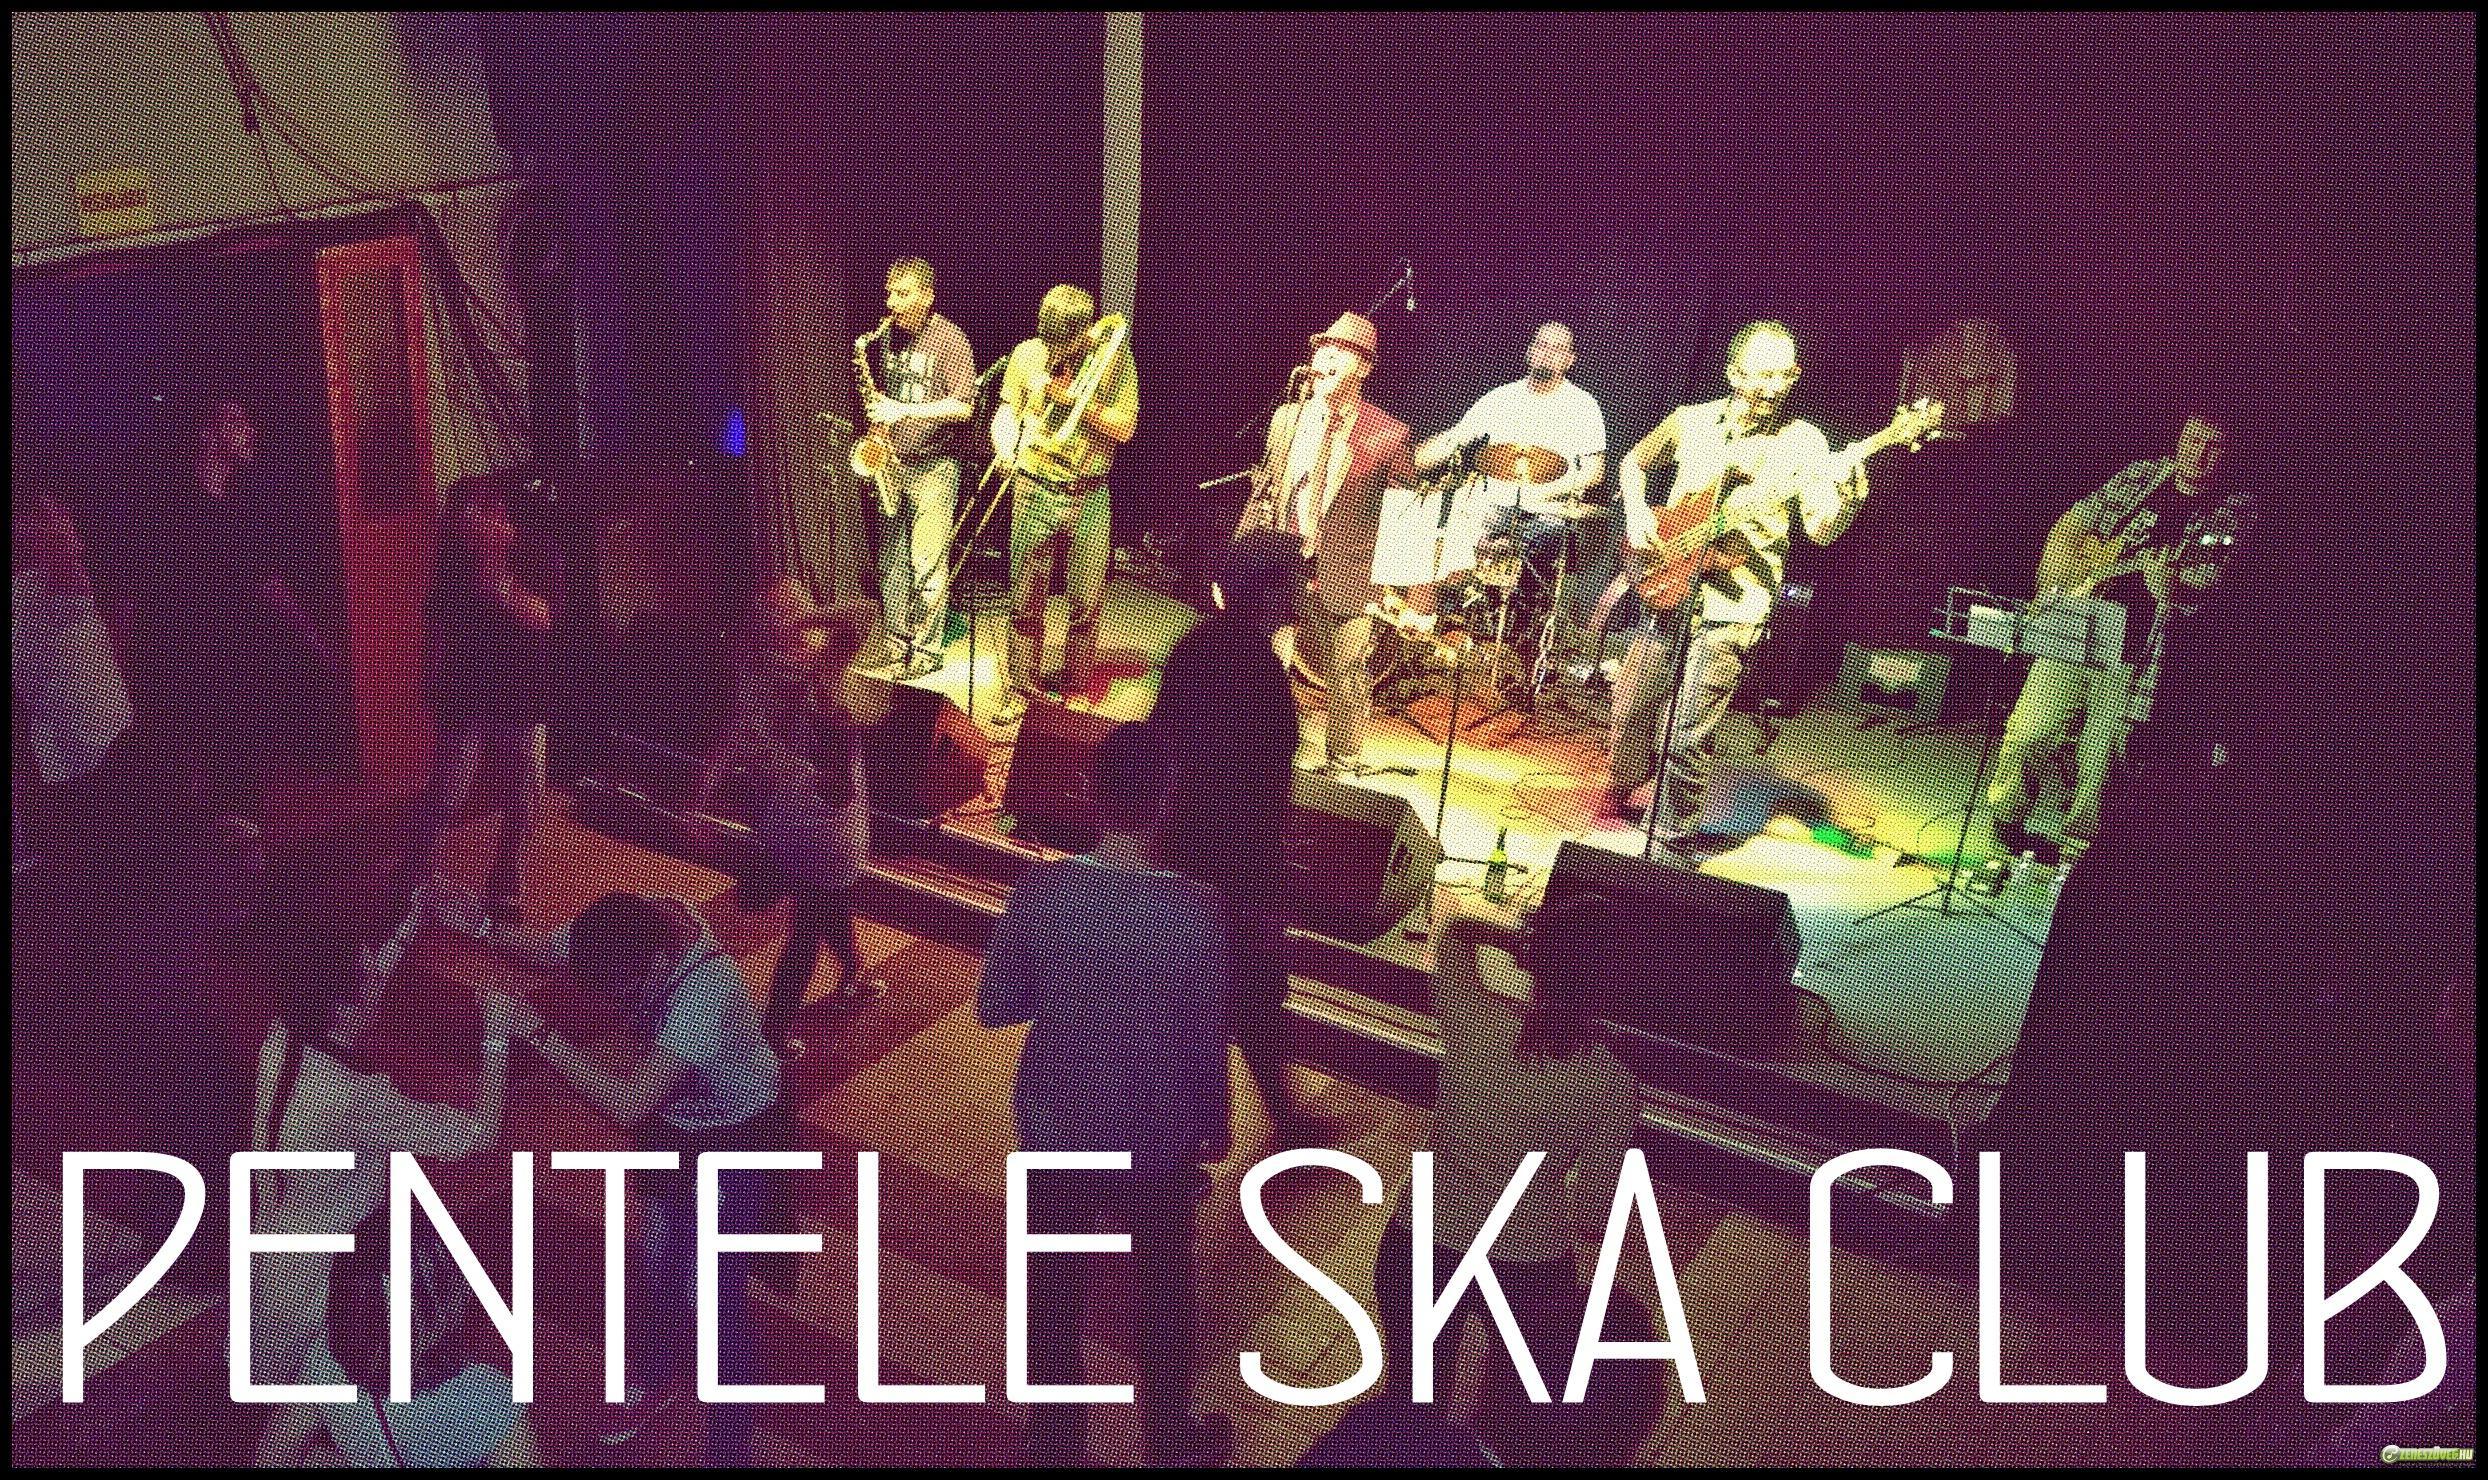 Pentele Ska Club